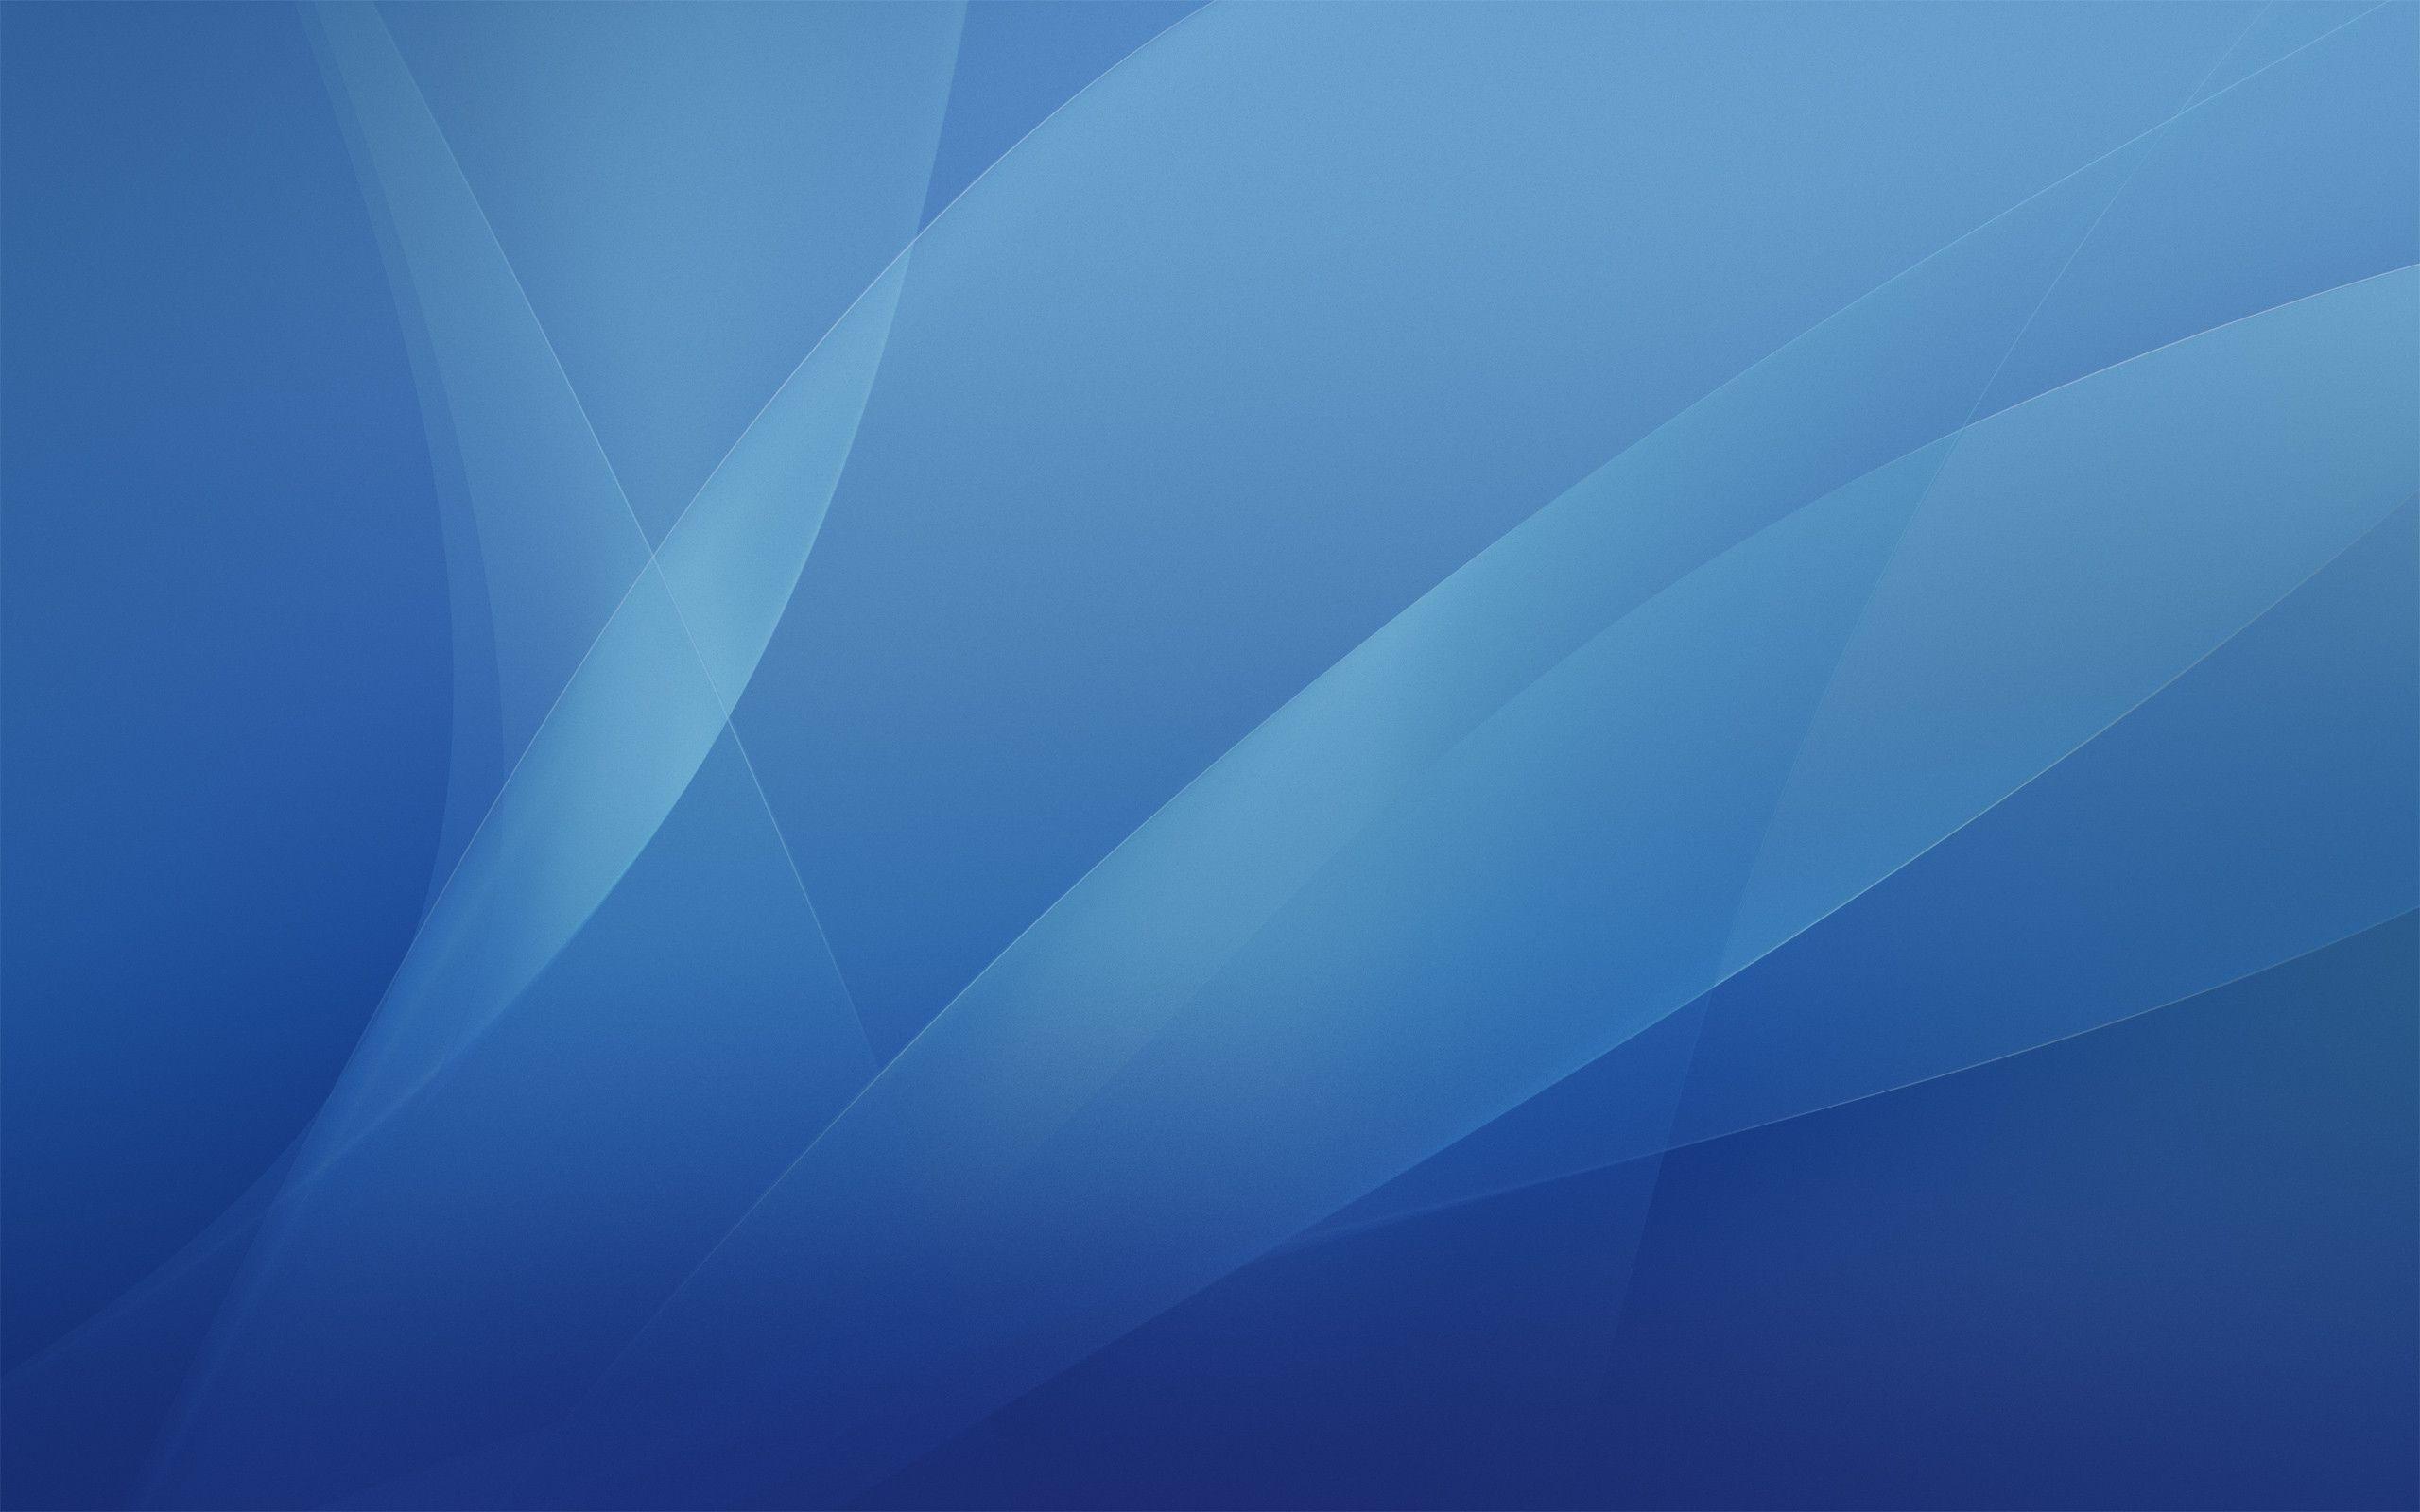 desktop backgrounds for mac os x